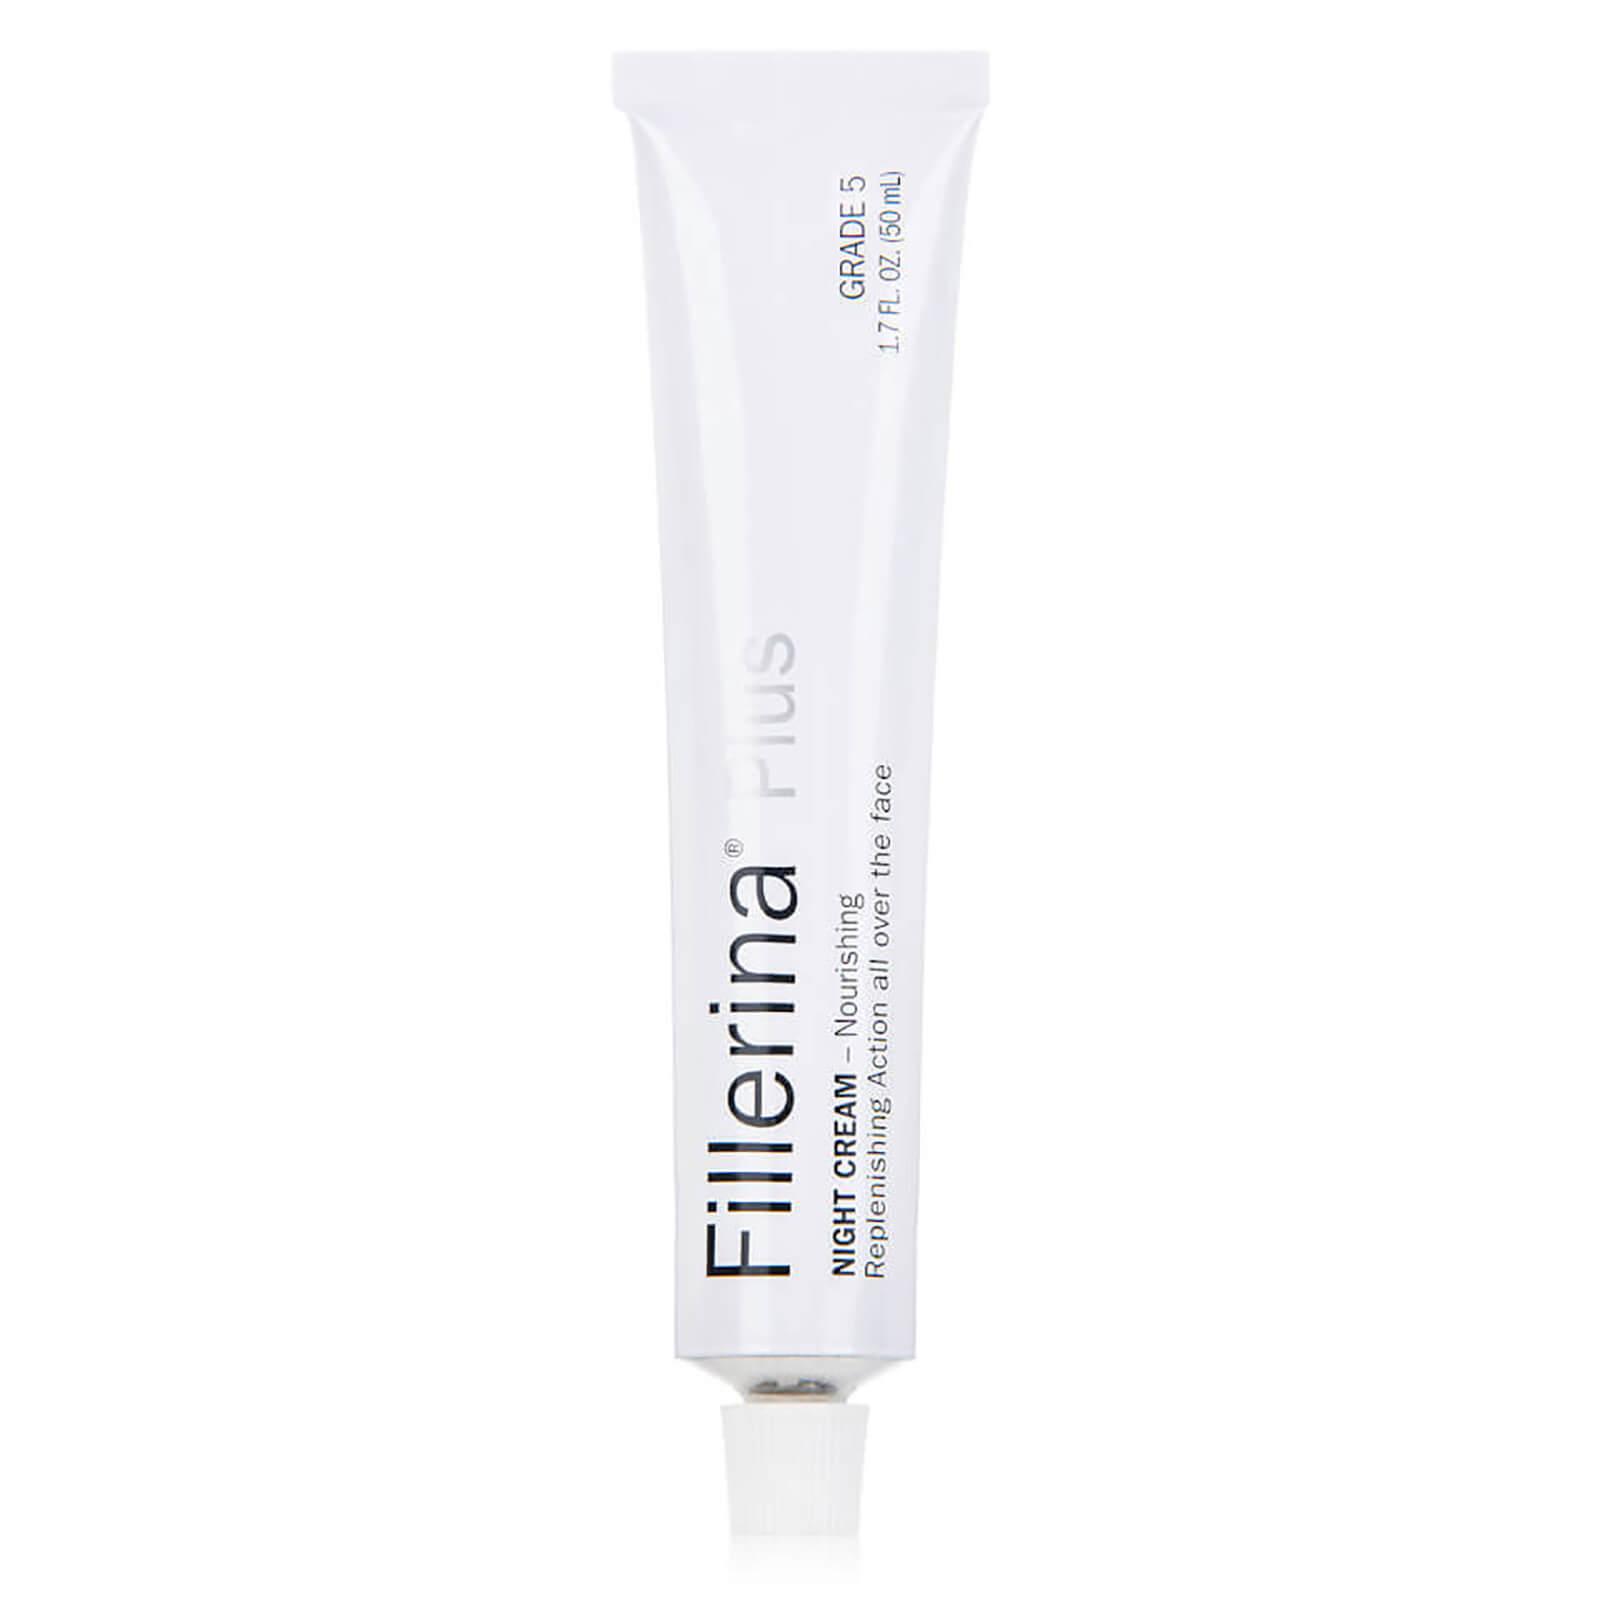 Fillerina Plus Night Cream Grade 5 (1.7 Oz.) In White